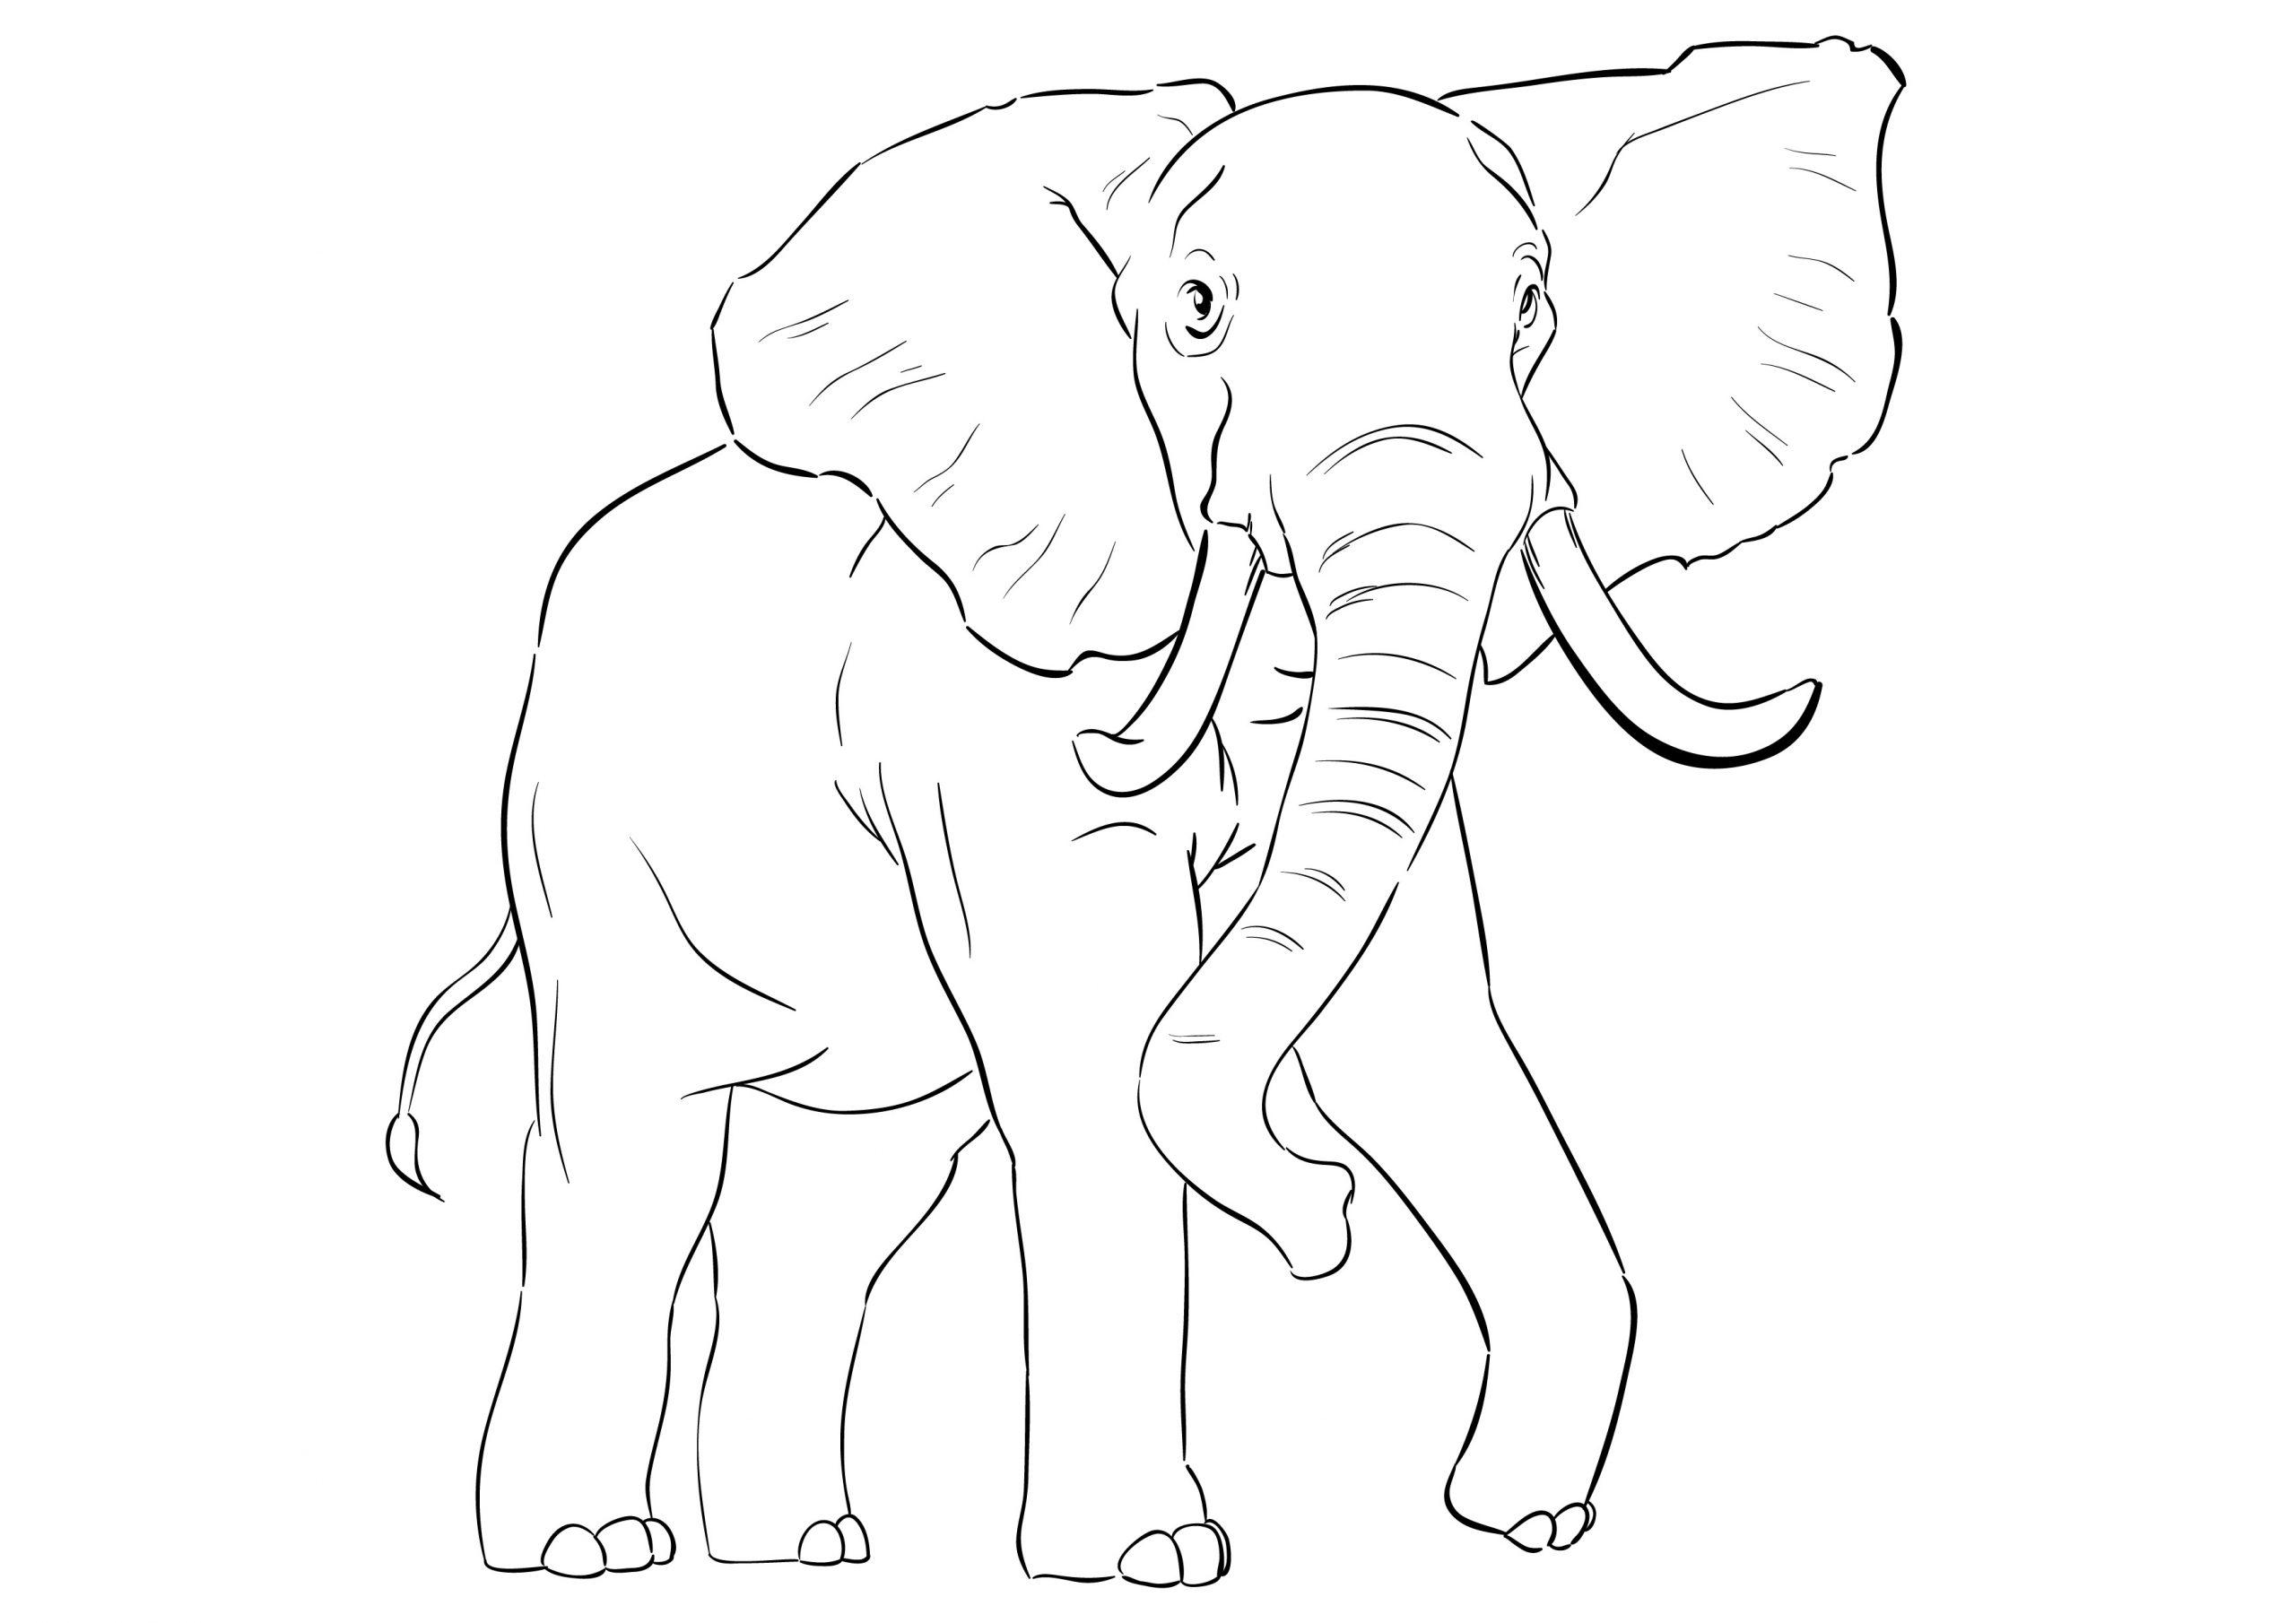 Elefant Malvorlage | Coloring And Malvorlagan in Malvorlage Elefant